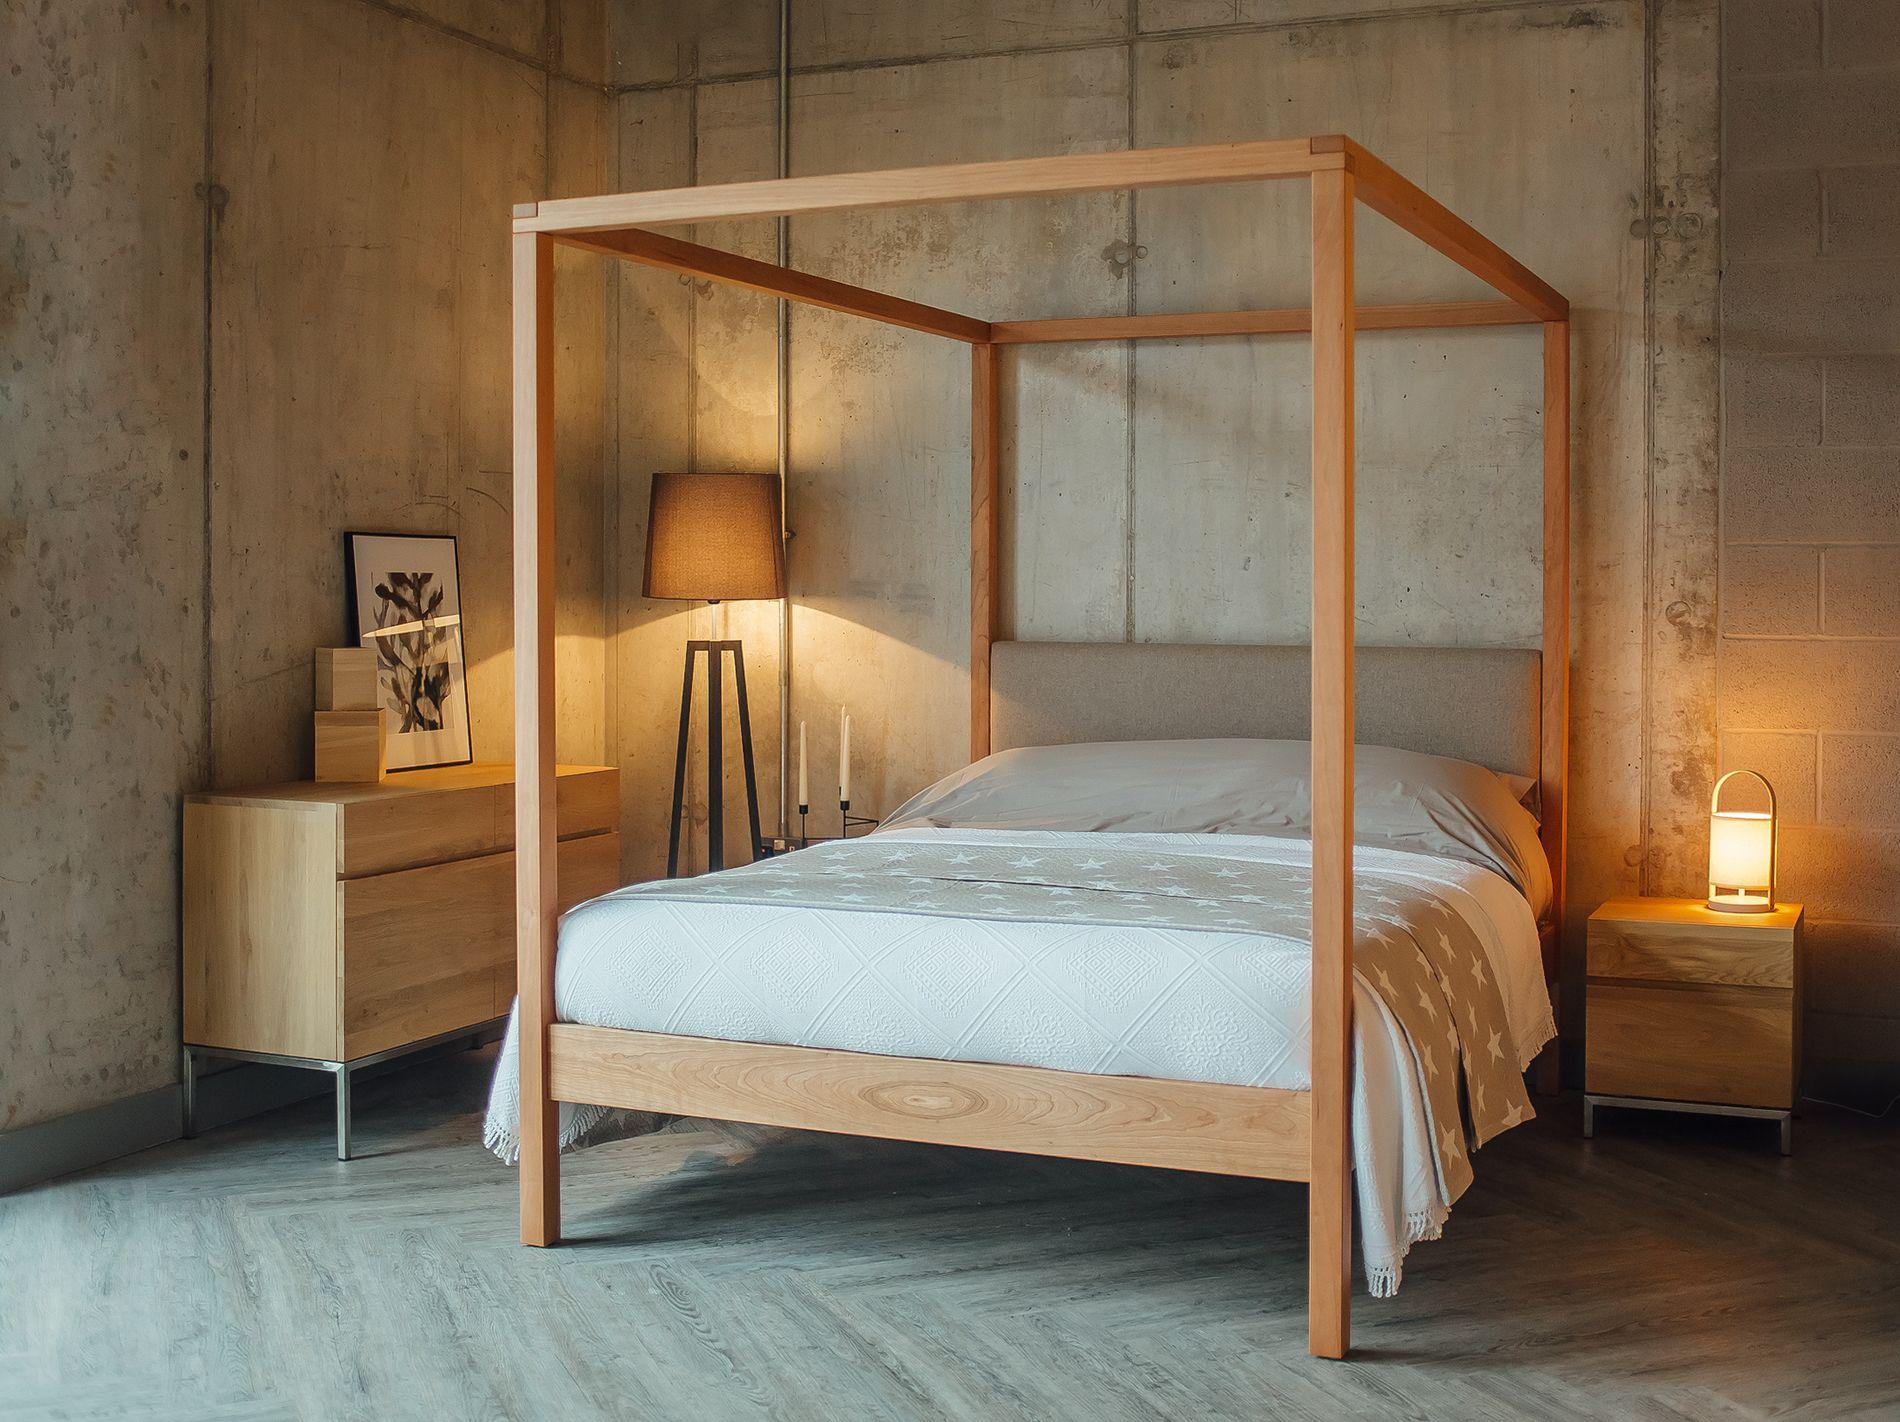 Best Highland Upholstered 4 Poster Bed Bed Design Four 400 x 300